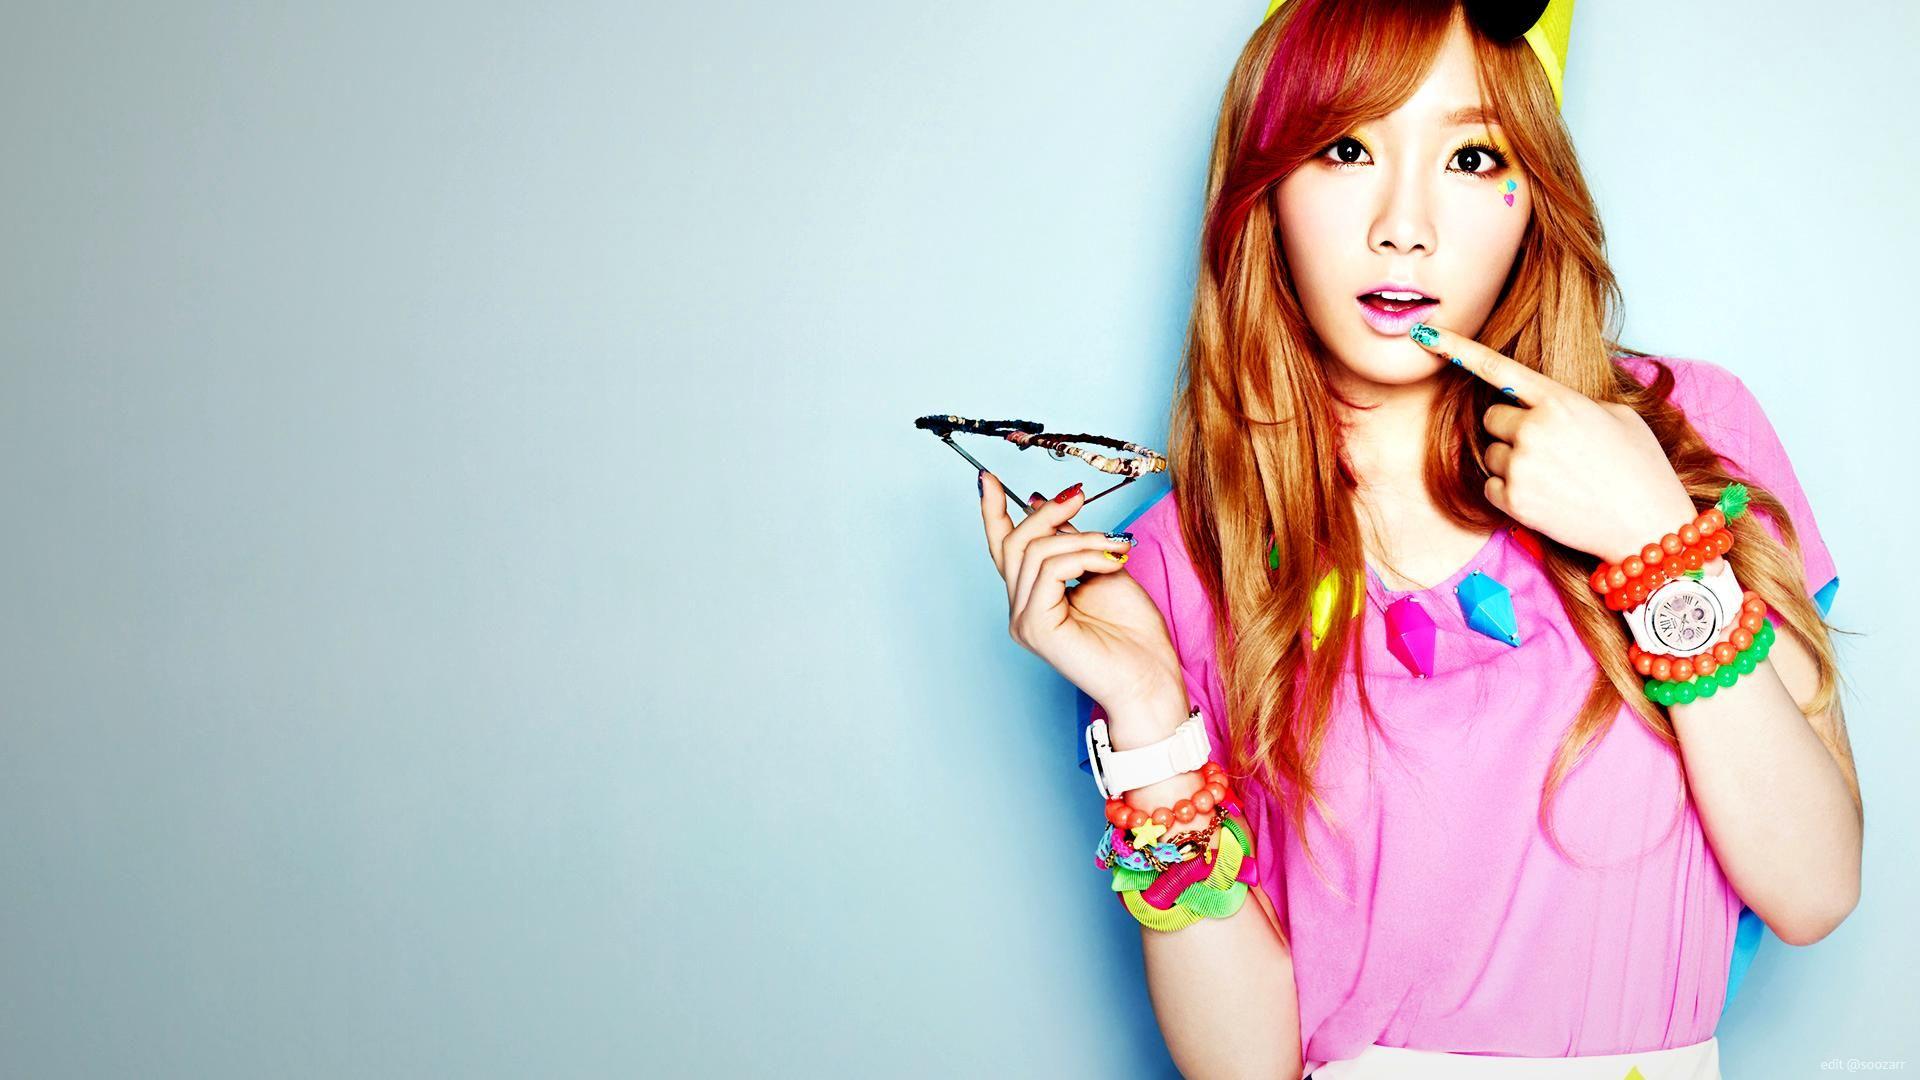 SNSD 2013 Girls Generation HD Wallpaper SNSD 2013 Girls Generation ...